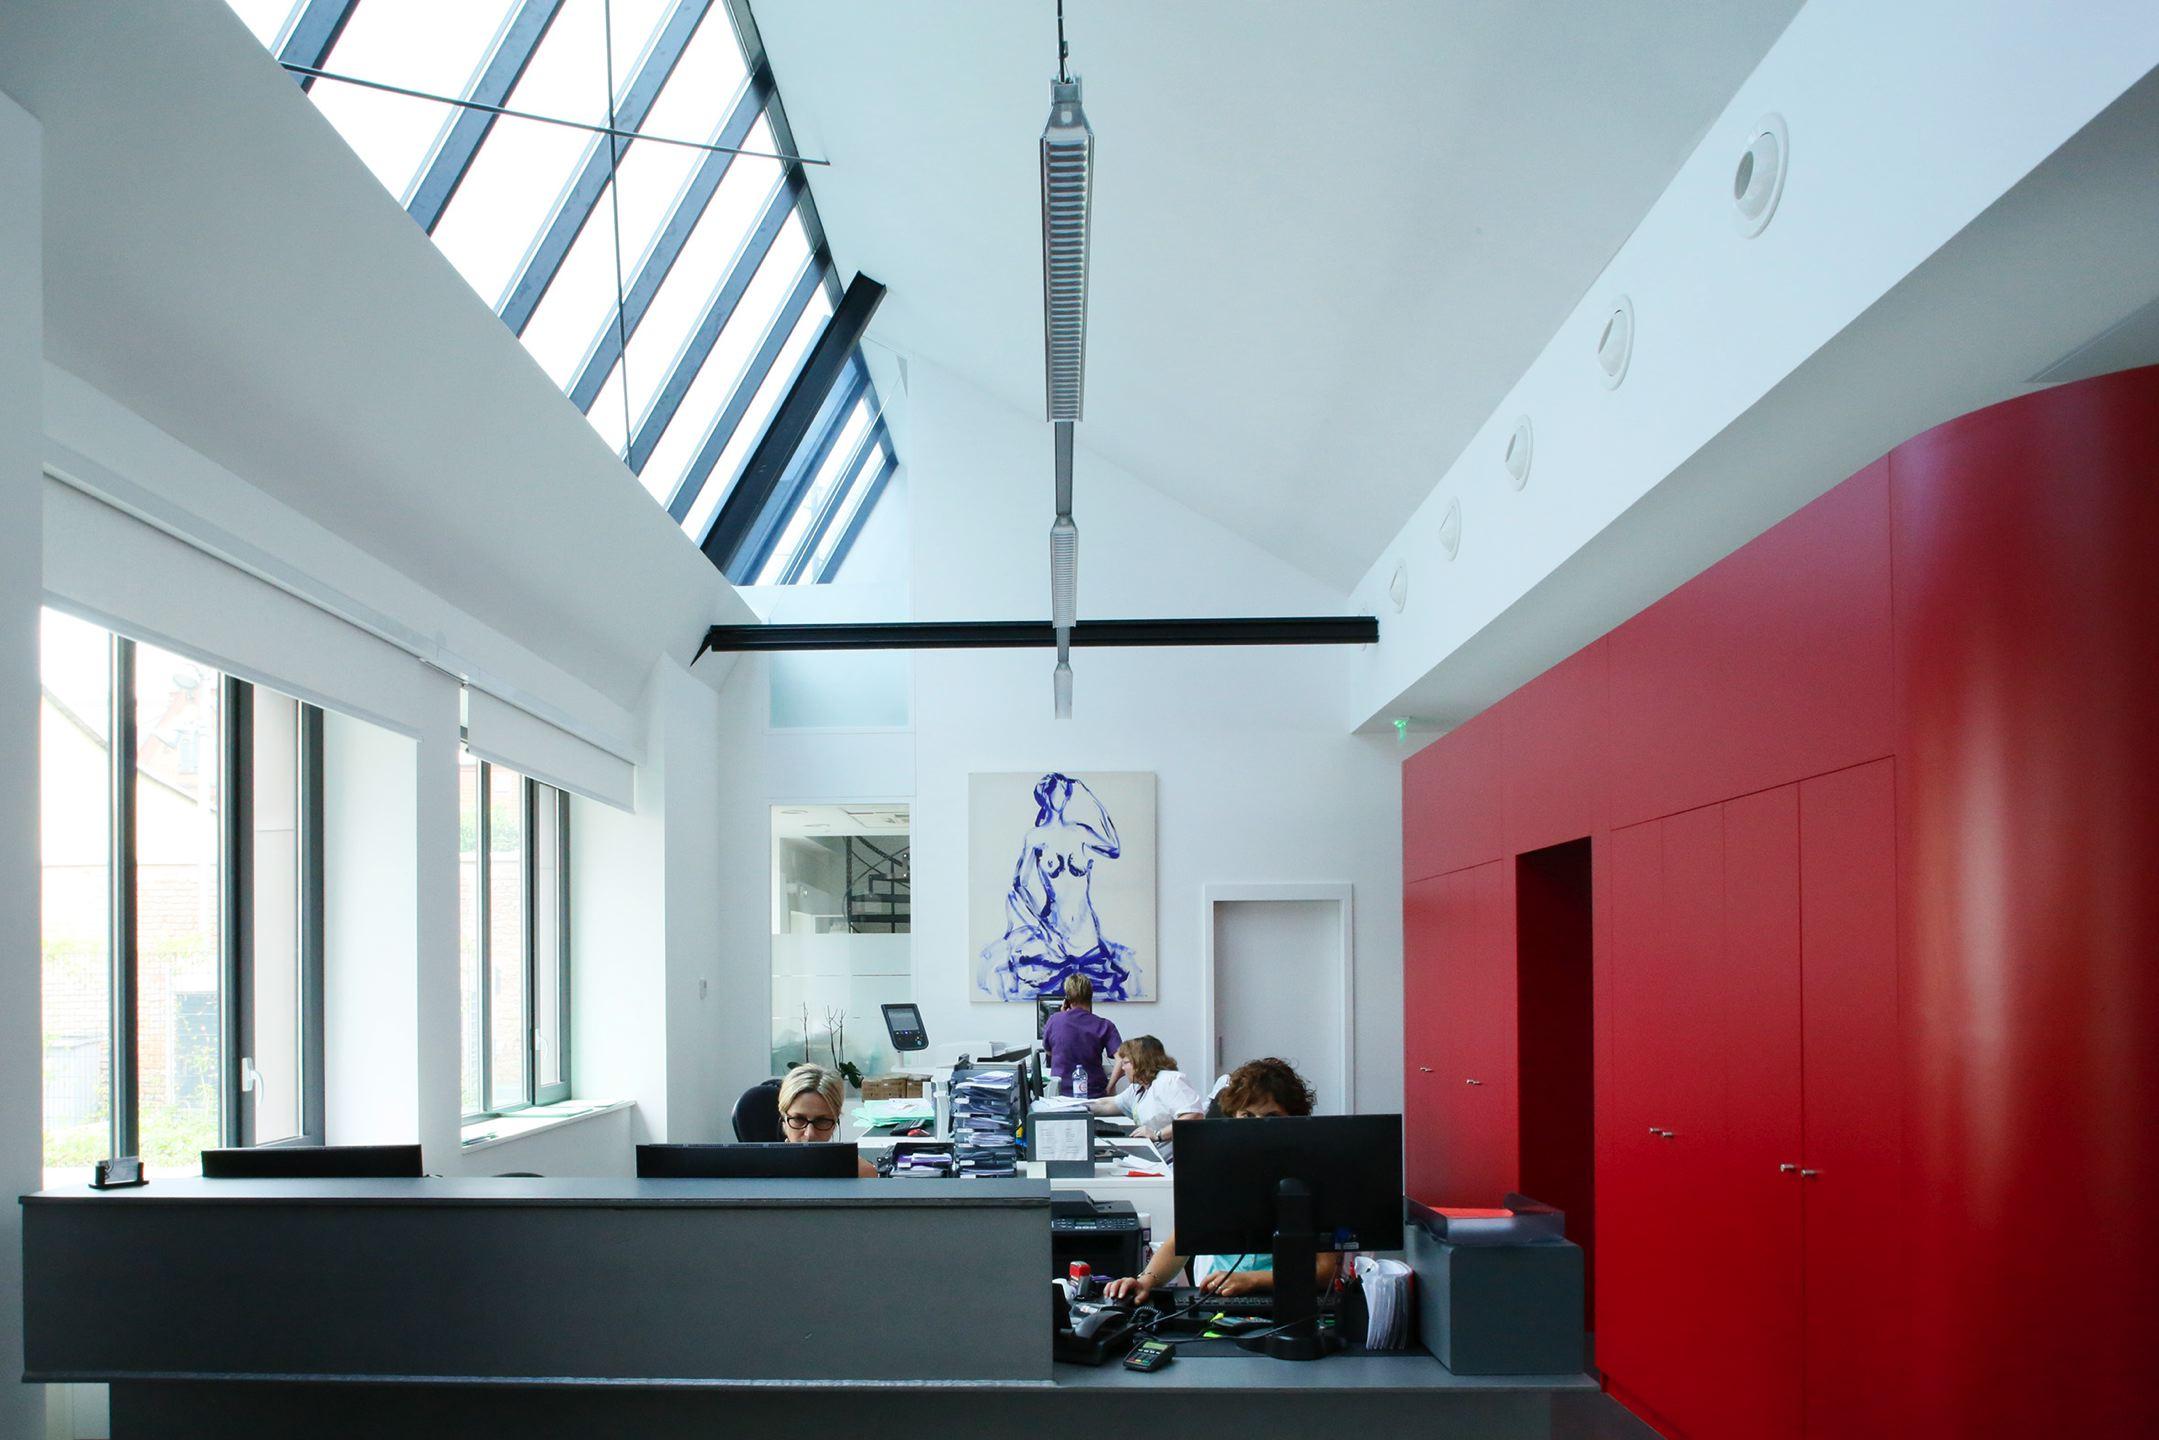 2012 cabinet de radiologie s lestat 67 rca a - Cabinet de radiologie altkirch ...